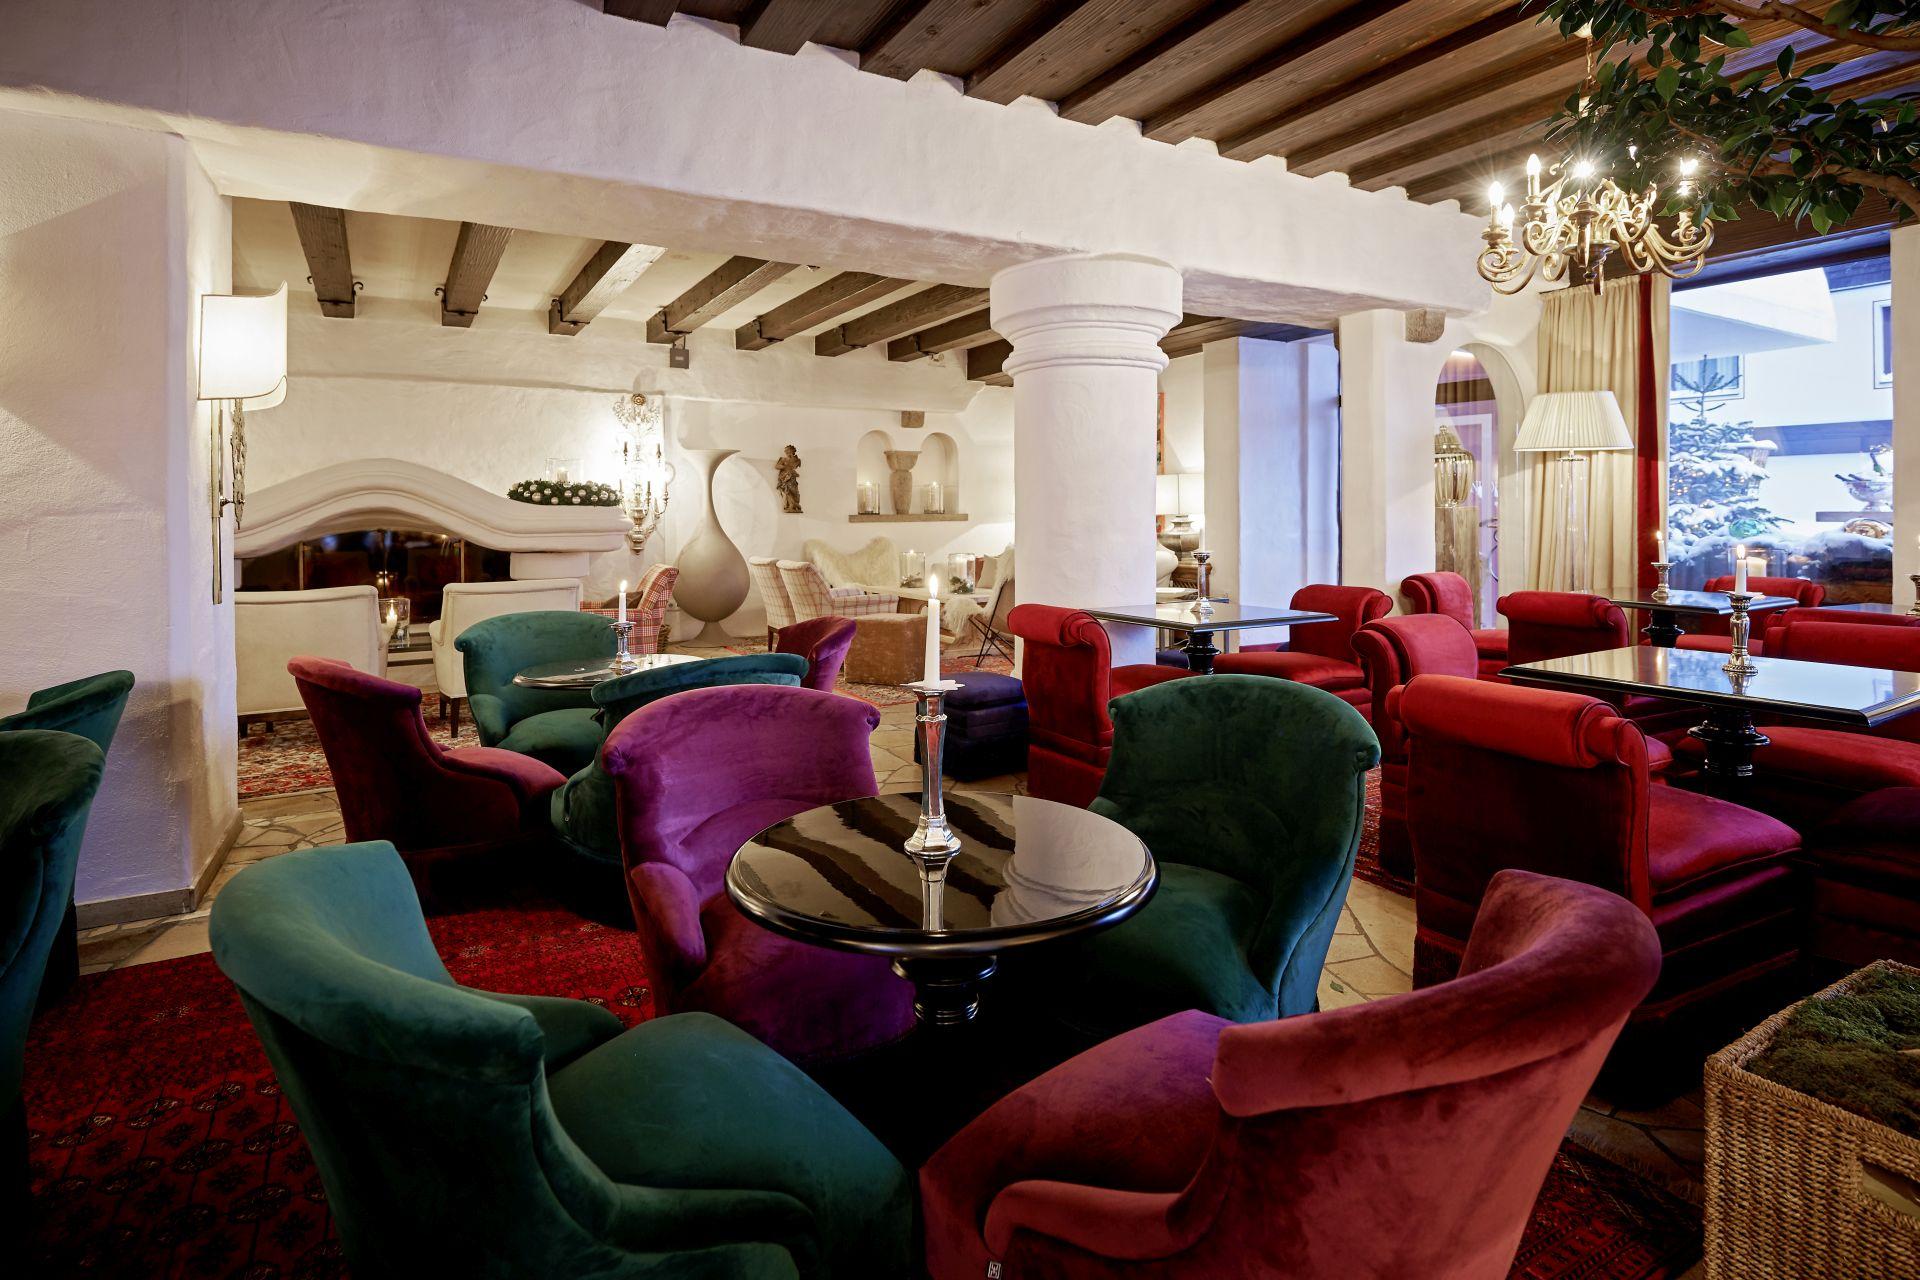 Coco's Lounge im Hotel am Arlberg